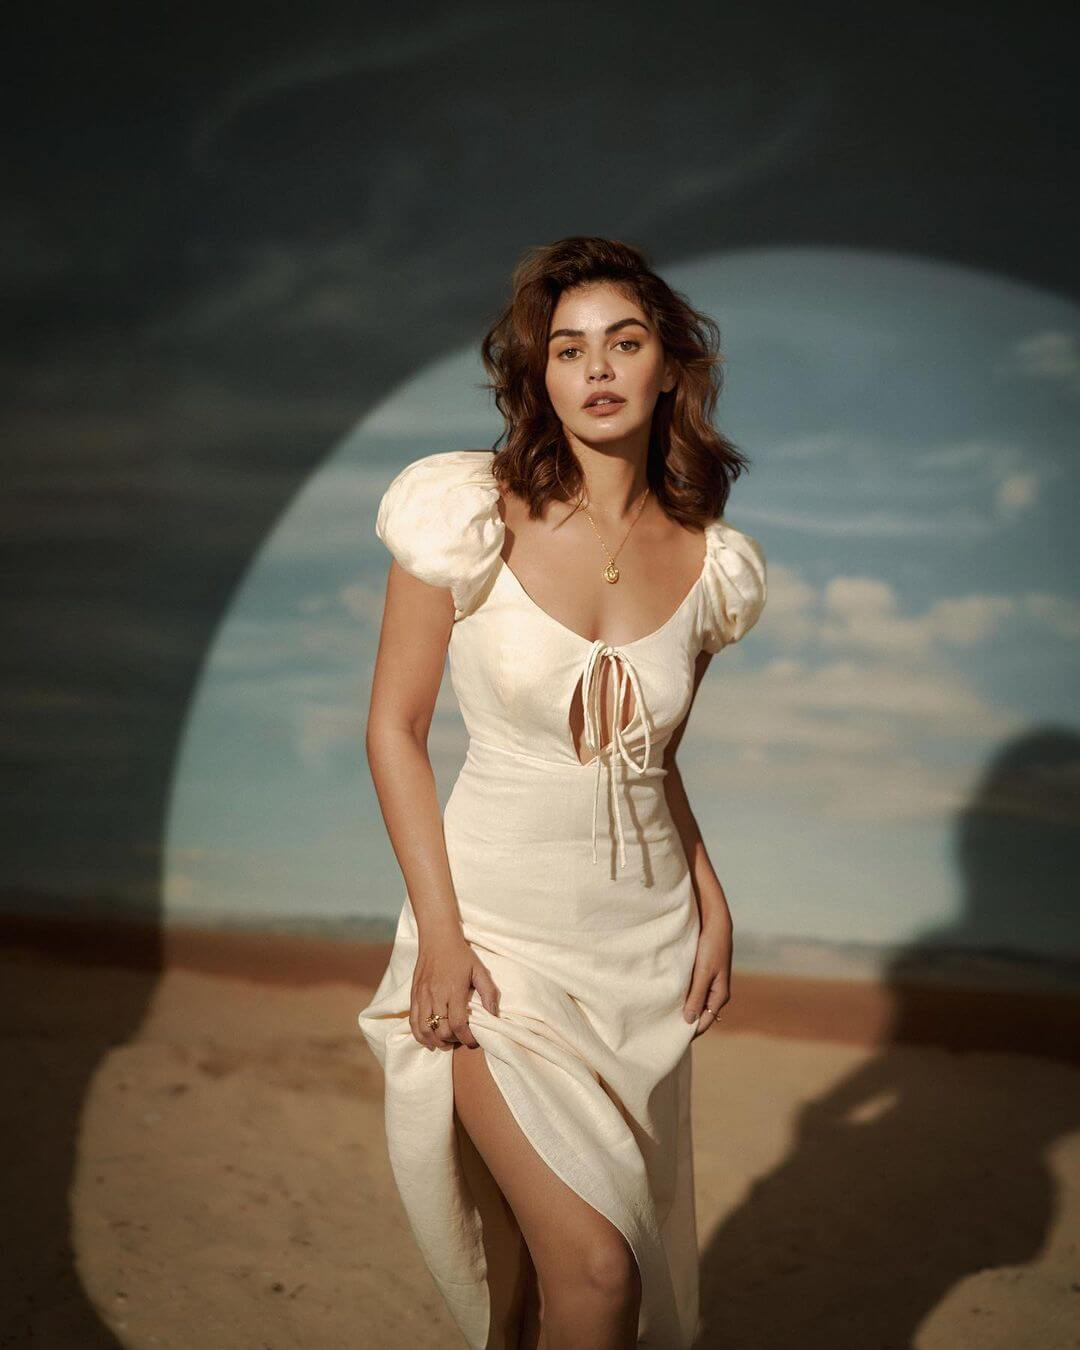 Janine Gutierrez In White Dress